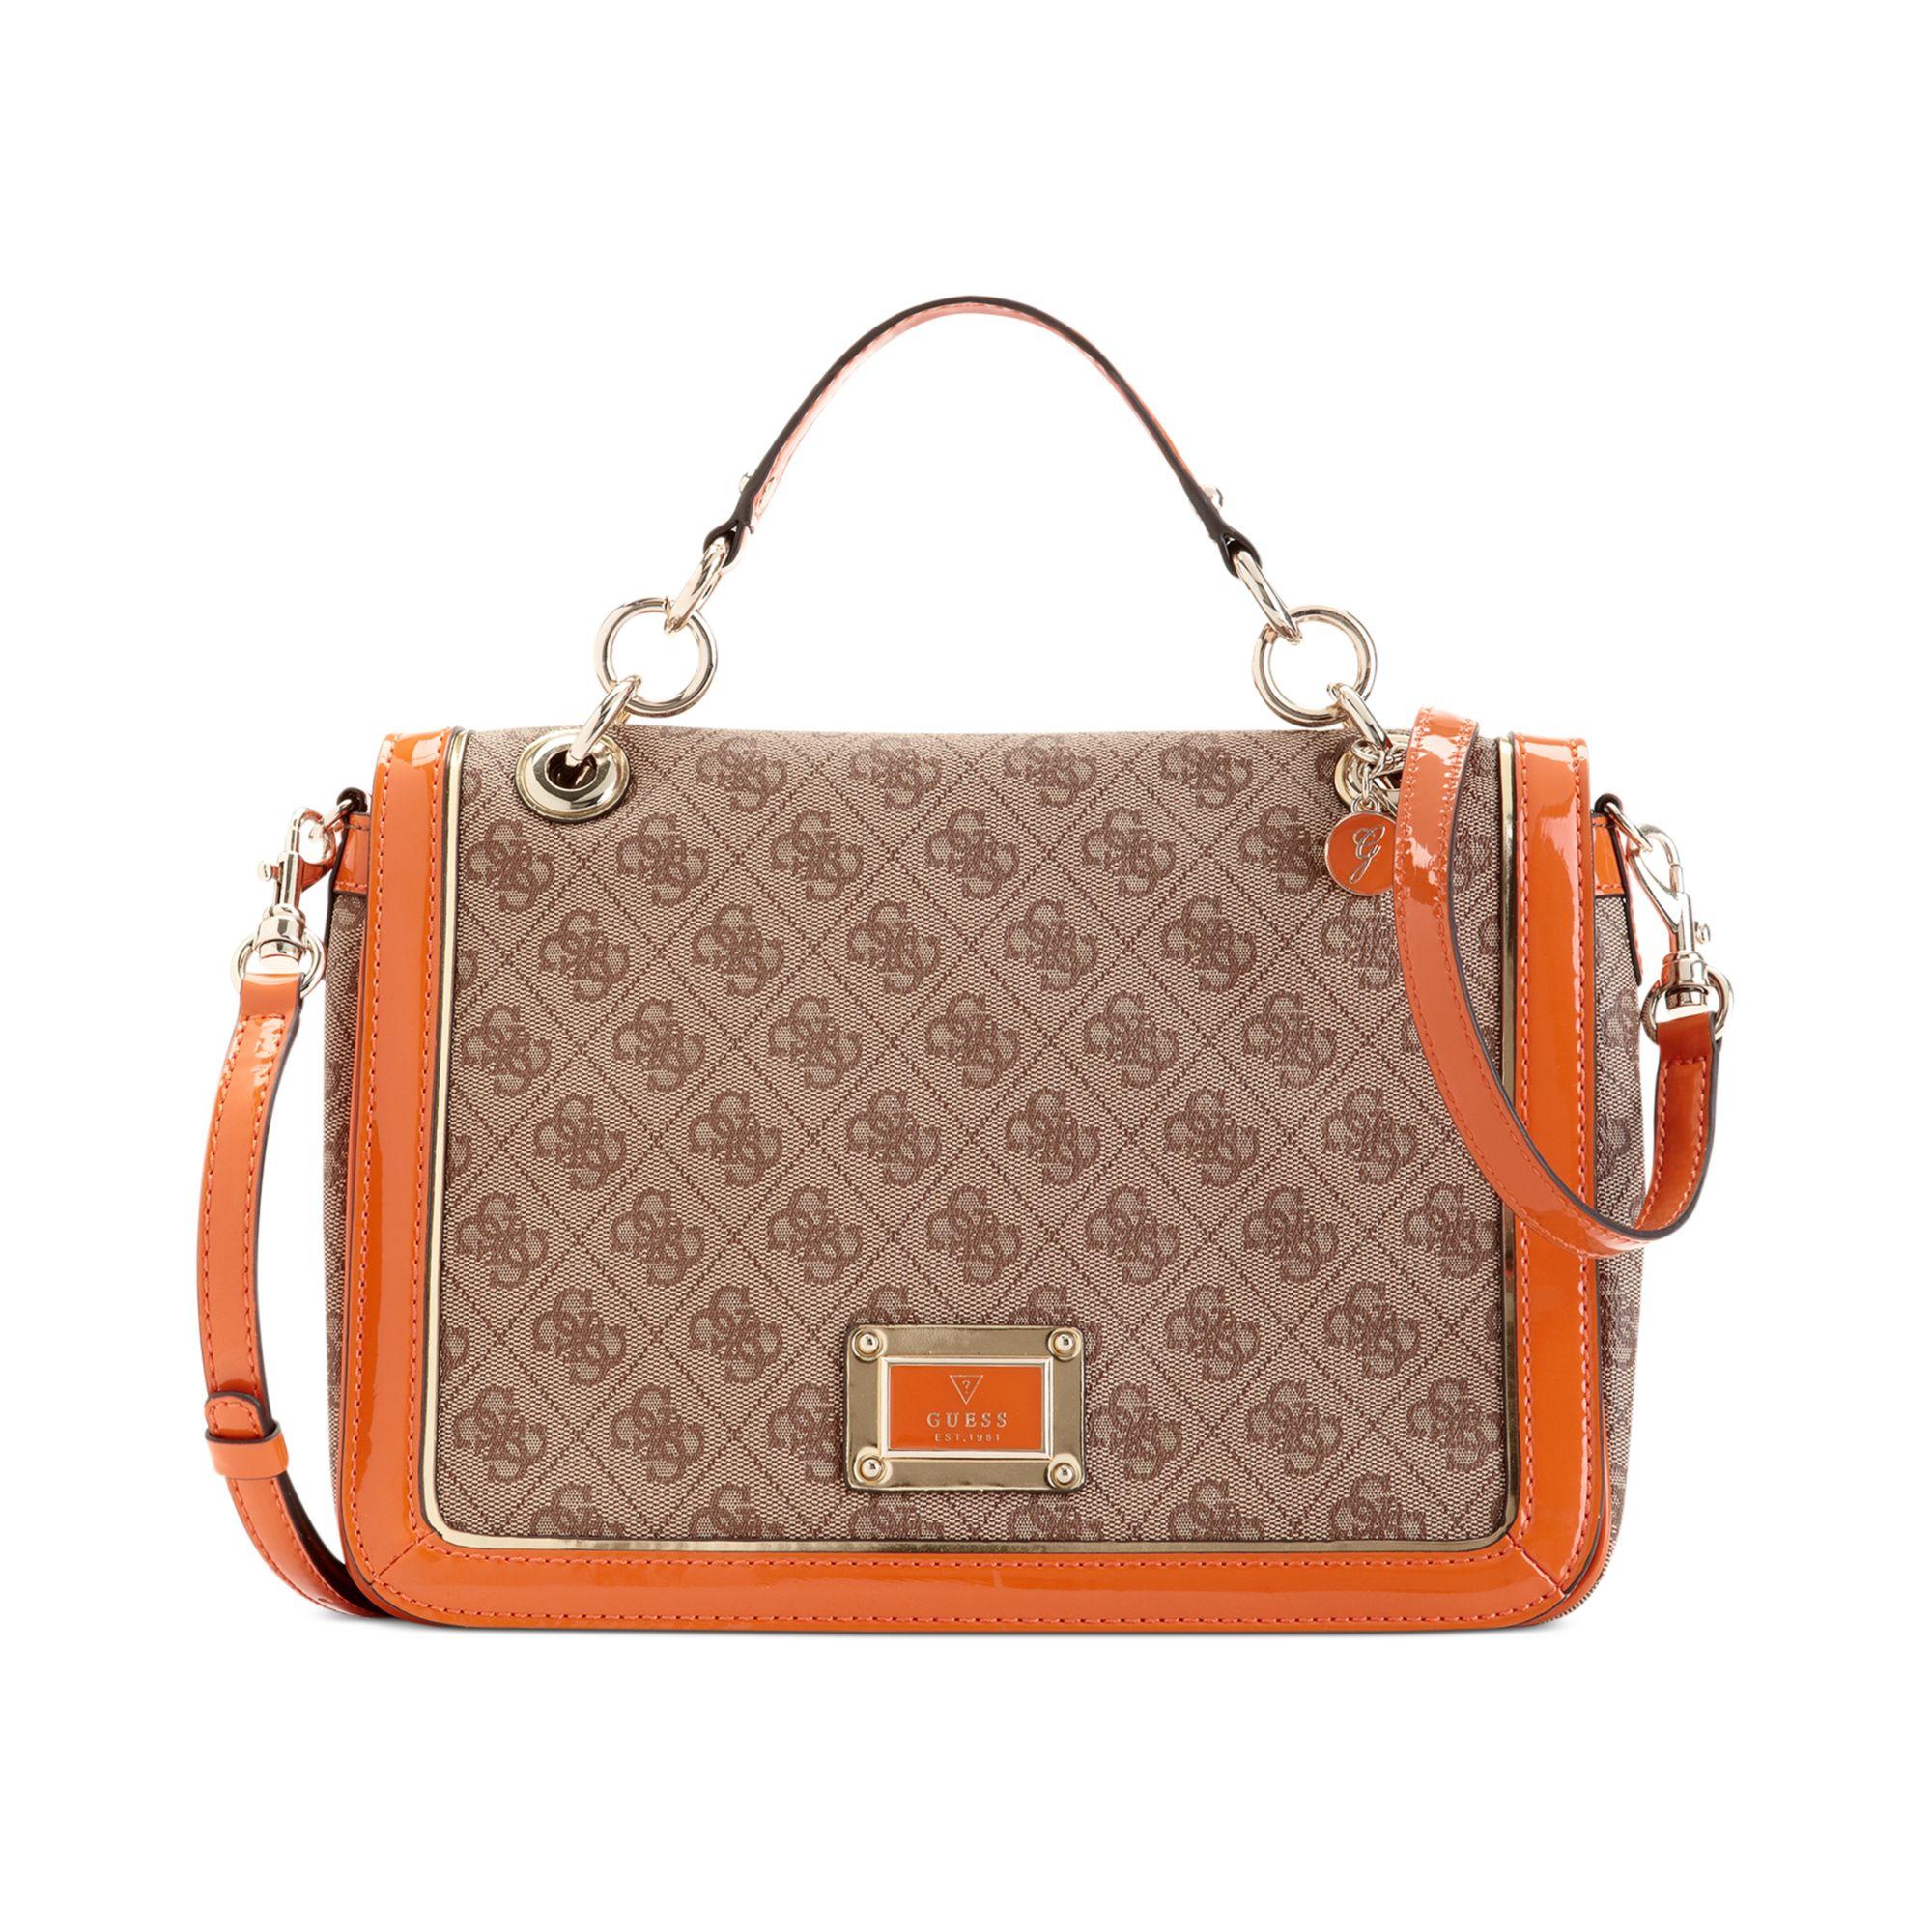 b6e94b3e99 Lyst - Guess Guess Handbag Reama Top Handle Flap Shoulder Bag in Orange